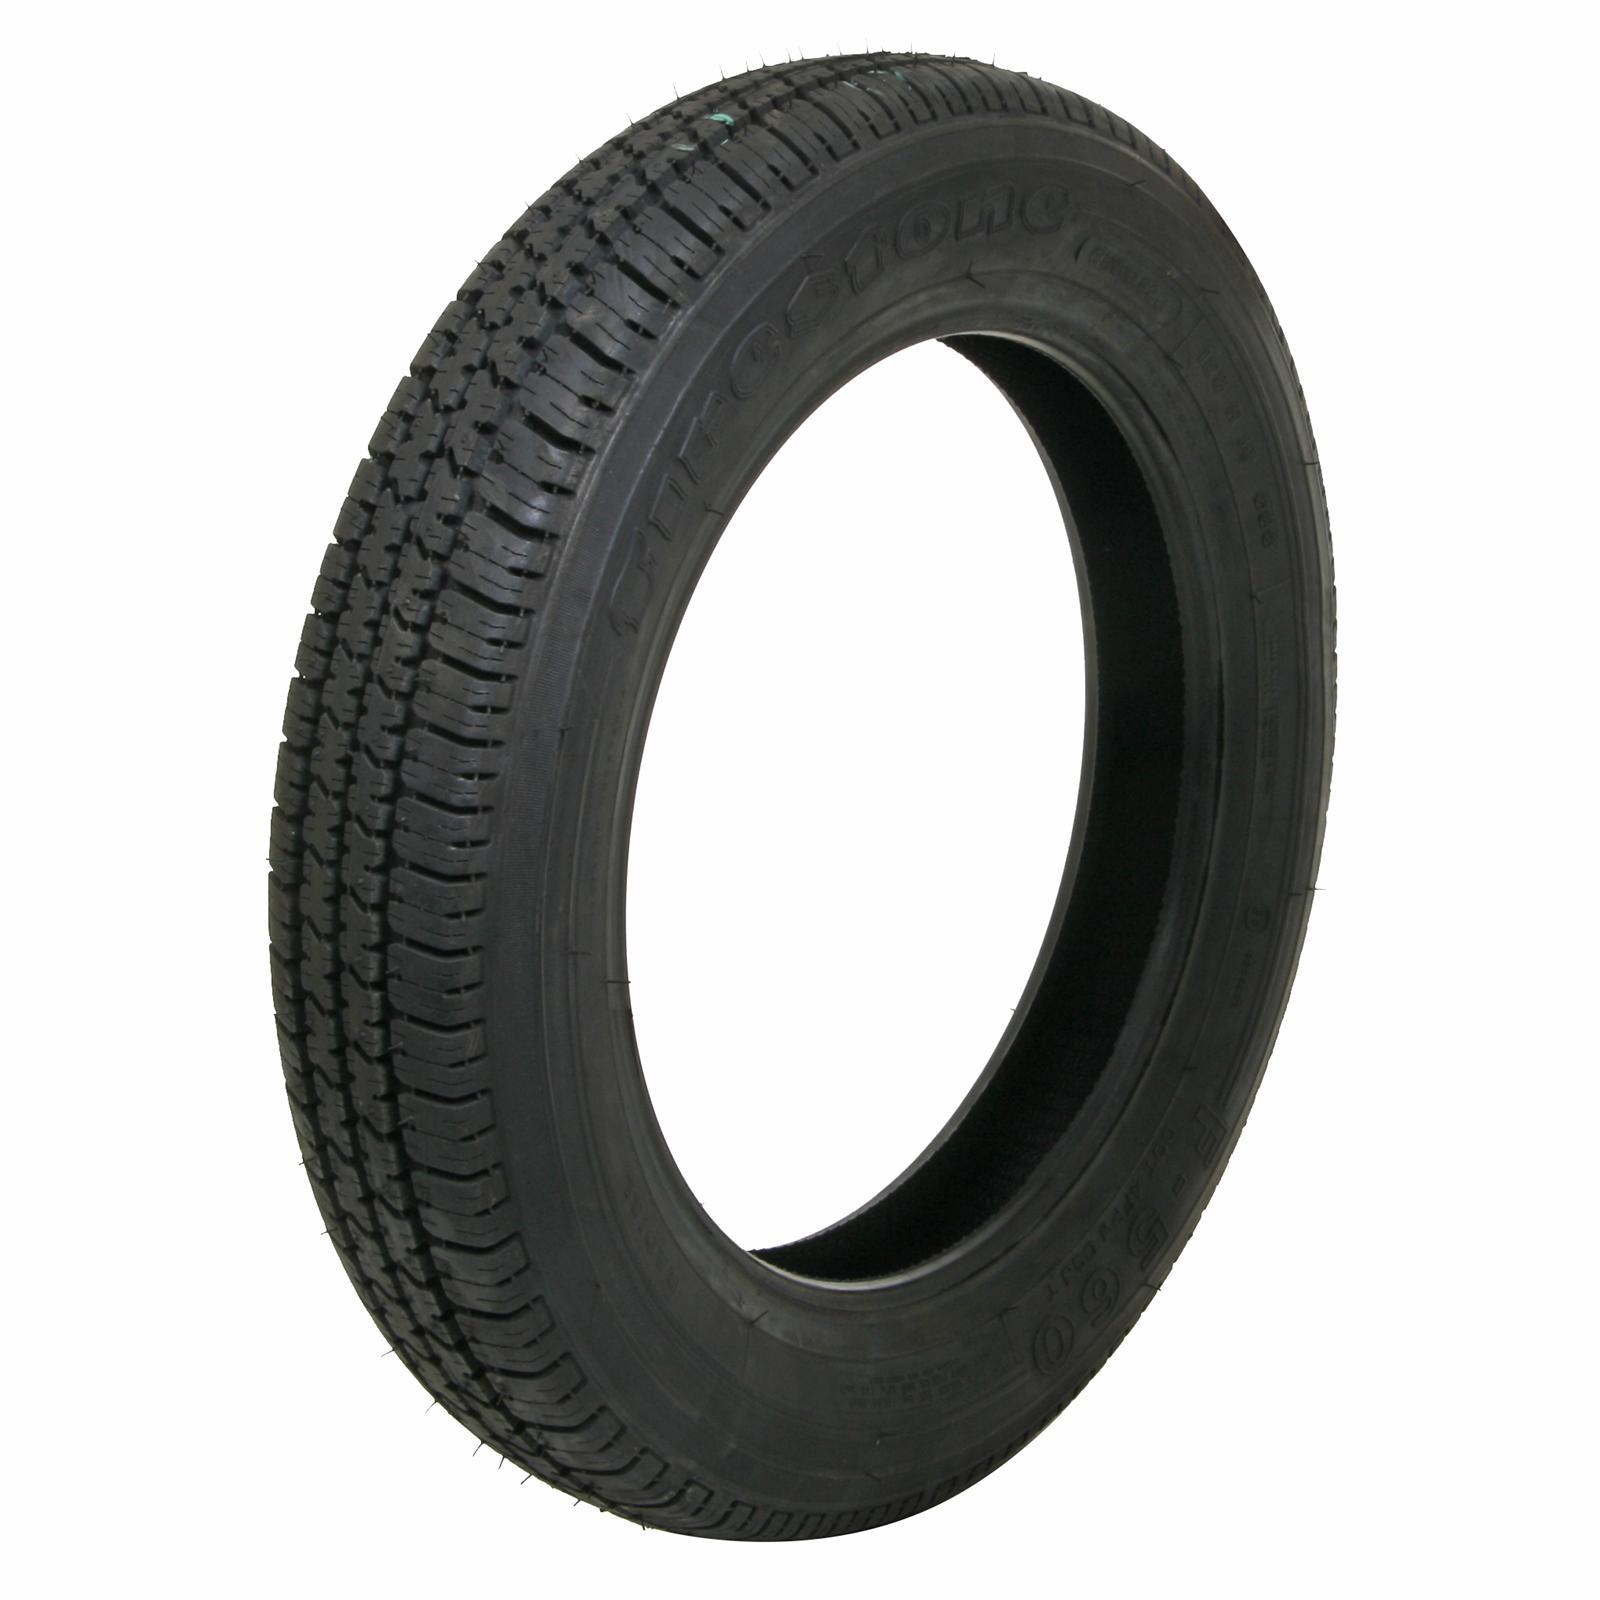 Pair 2 Coker Firestone F560 Tires 125 15 Radial Blackwall